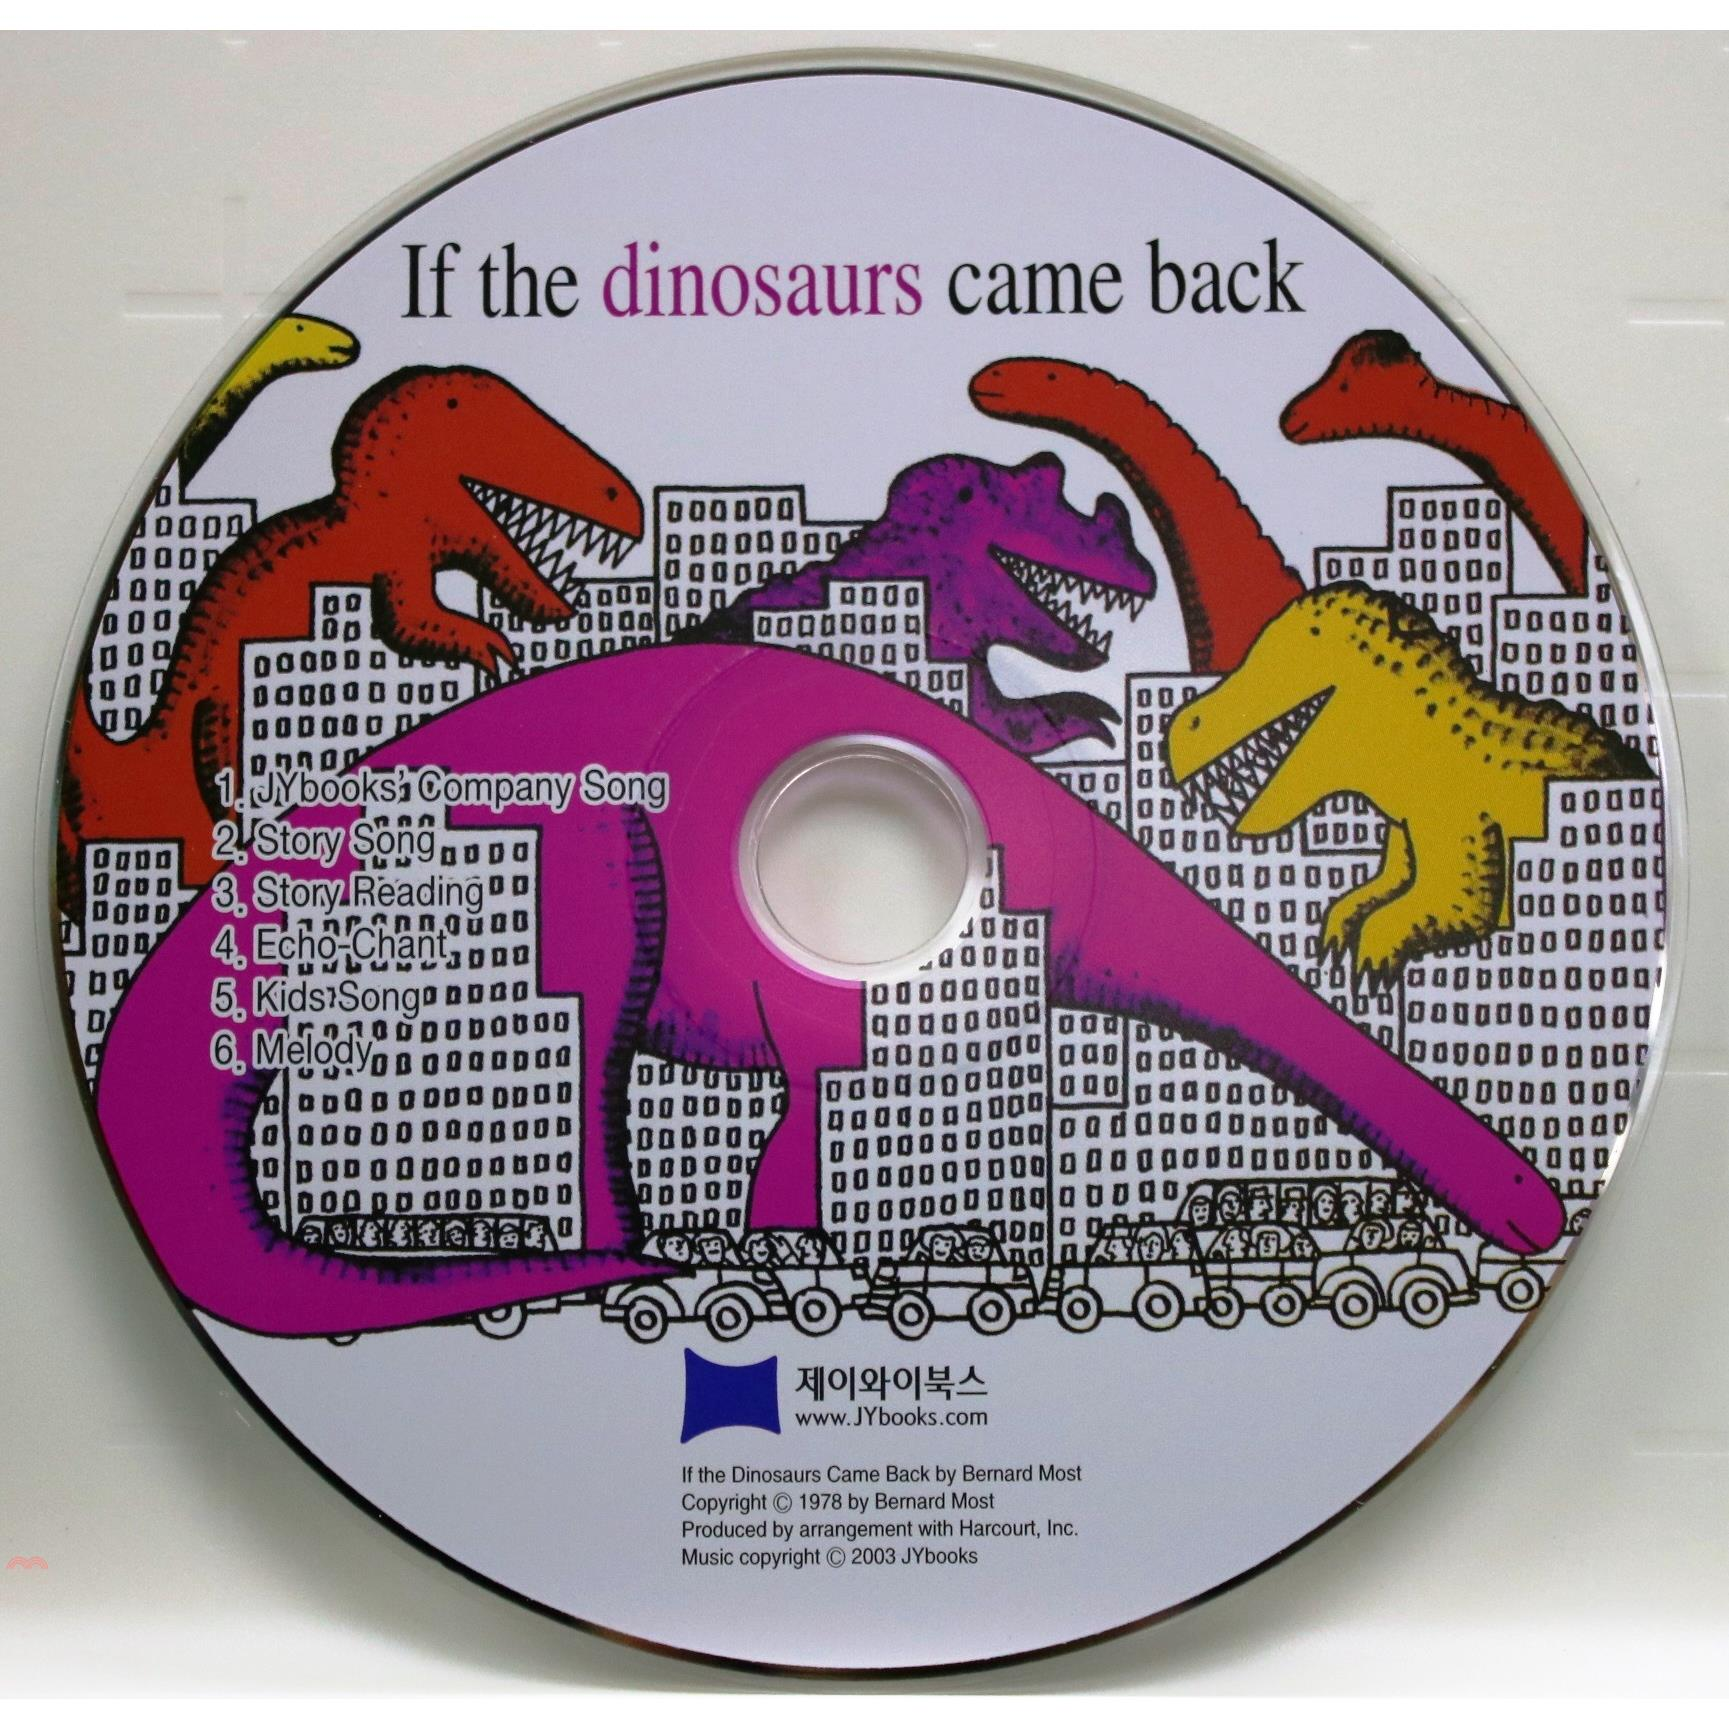 If the Dinosaurs Came Back (1 CD only)(韓國JY Books版)【三民網路書店】